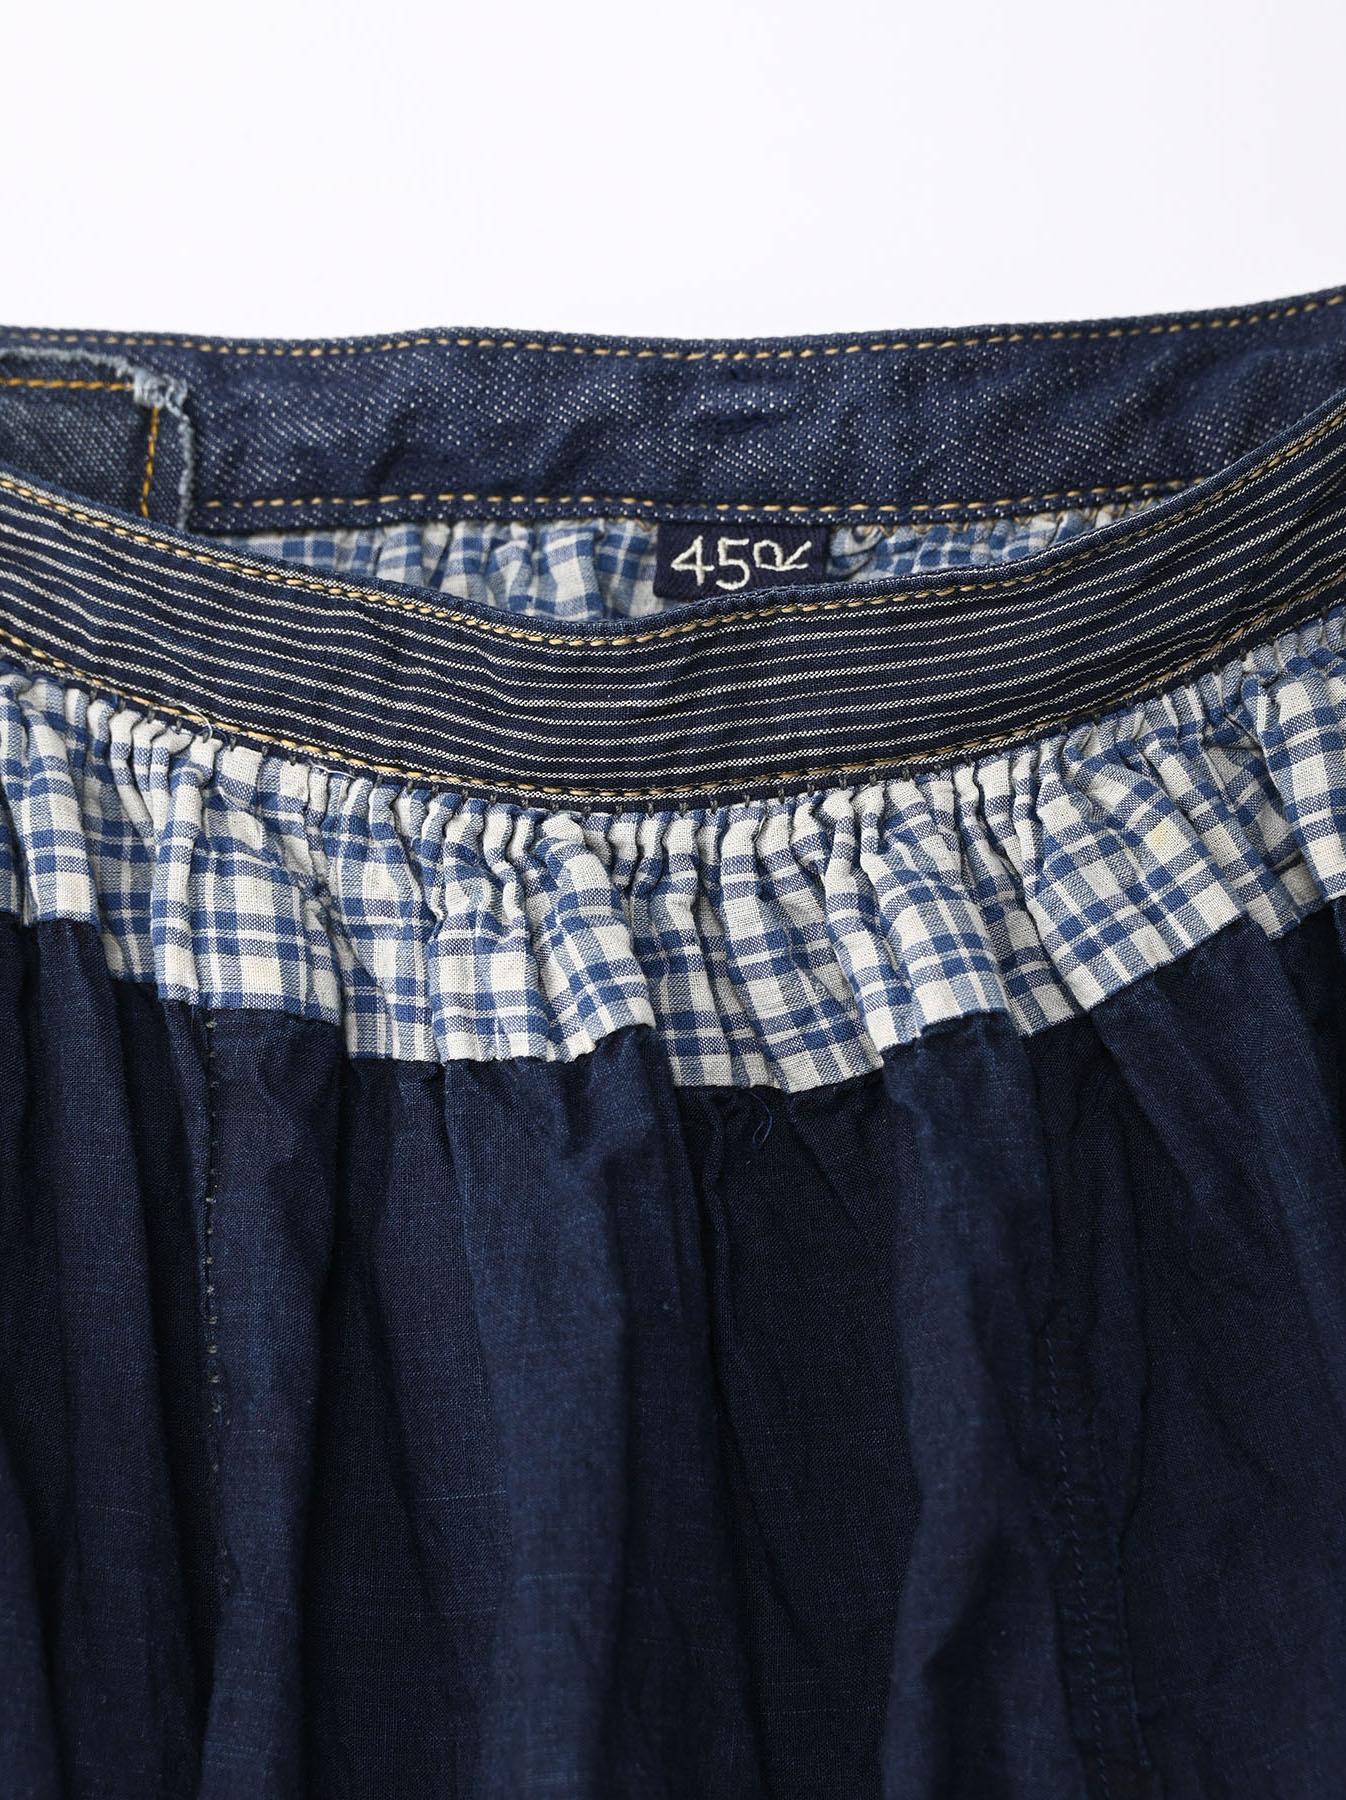 Indigo Tappet Patchwork Skirt-6